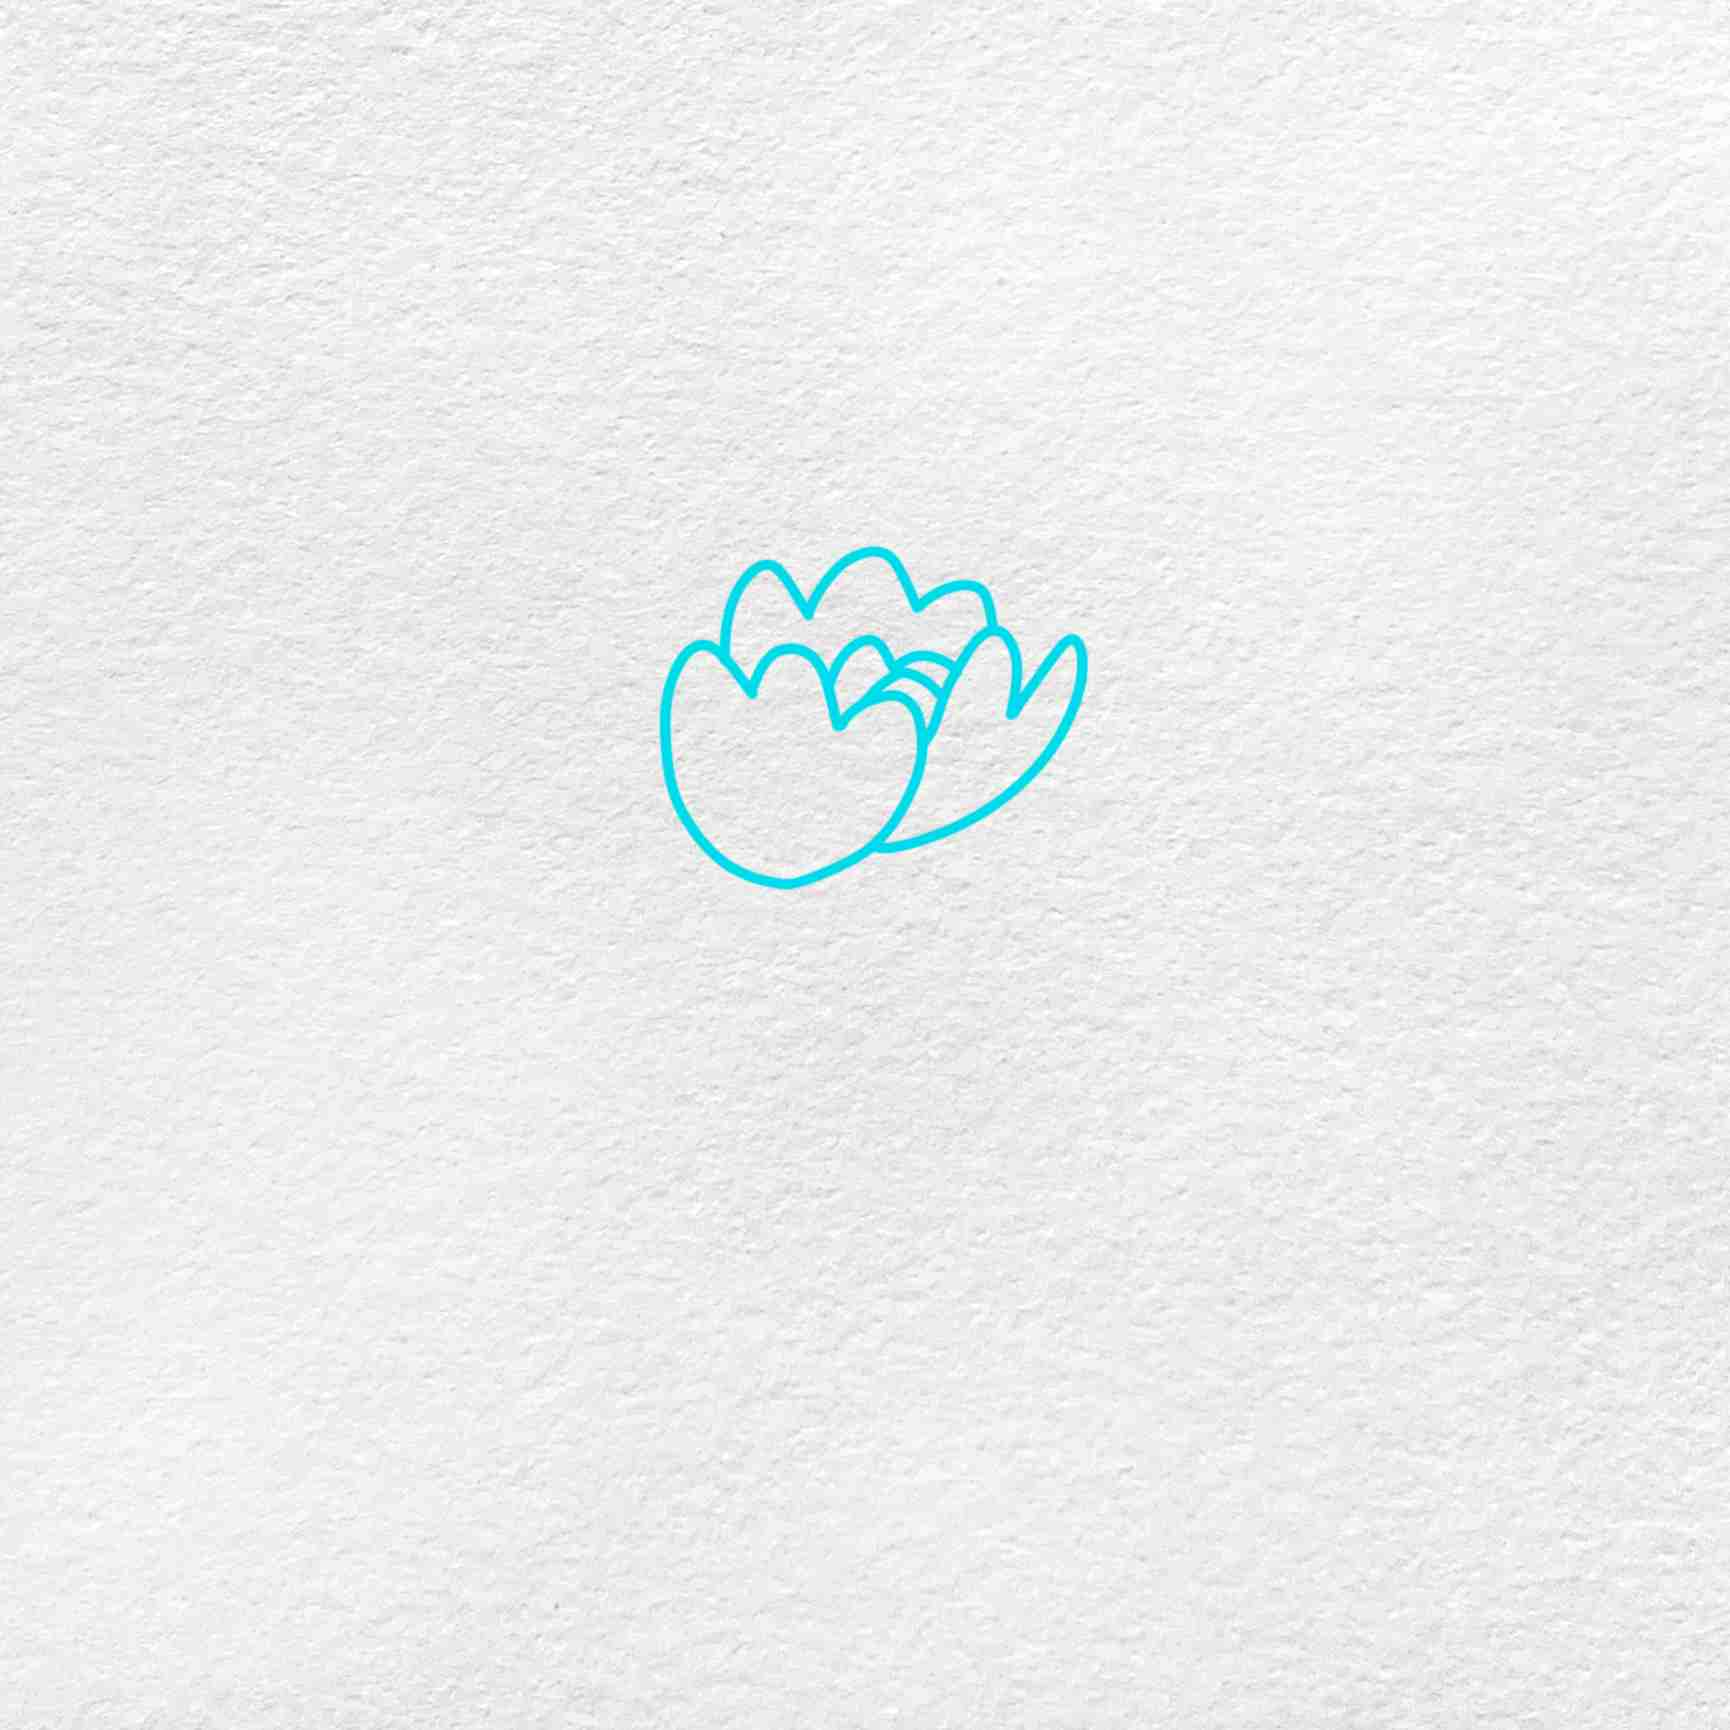 How To Draw Peony: Step 1